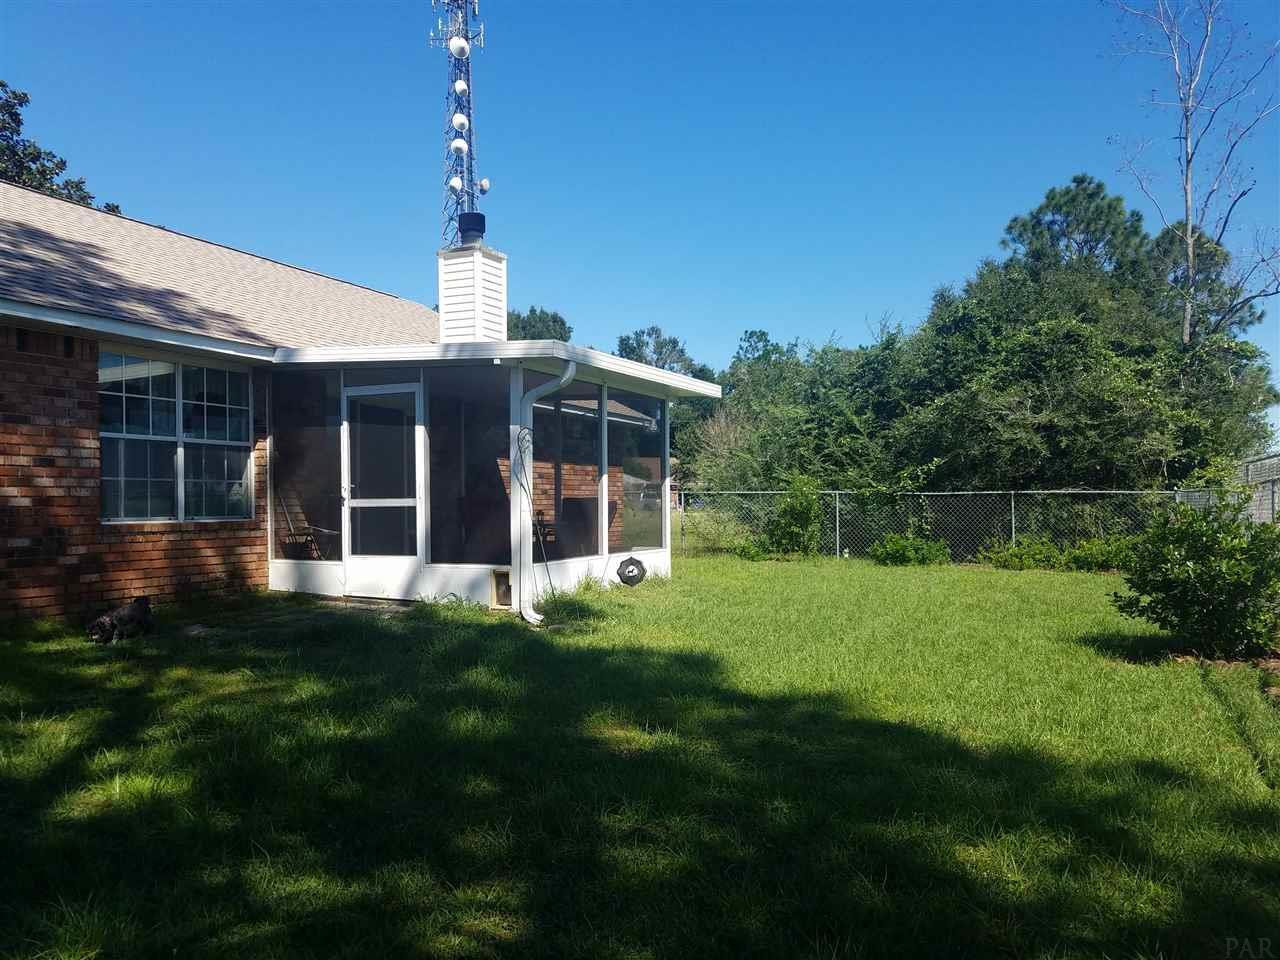 1229 Tiffany Dr, Pensacola, FL 32514